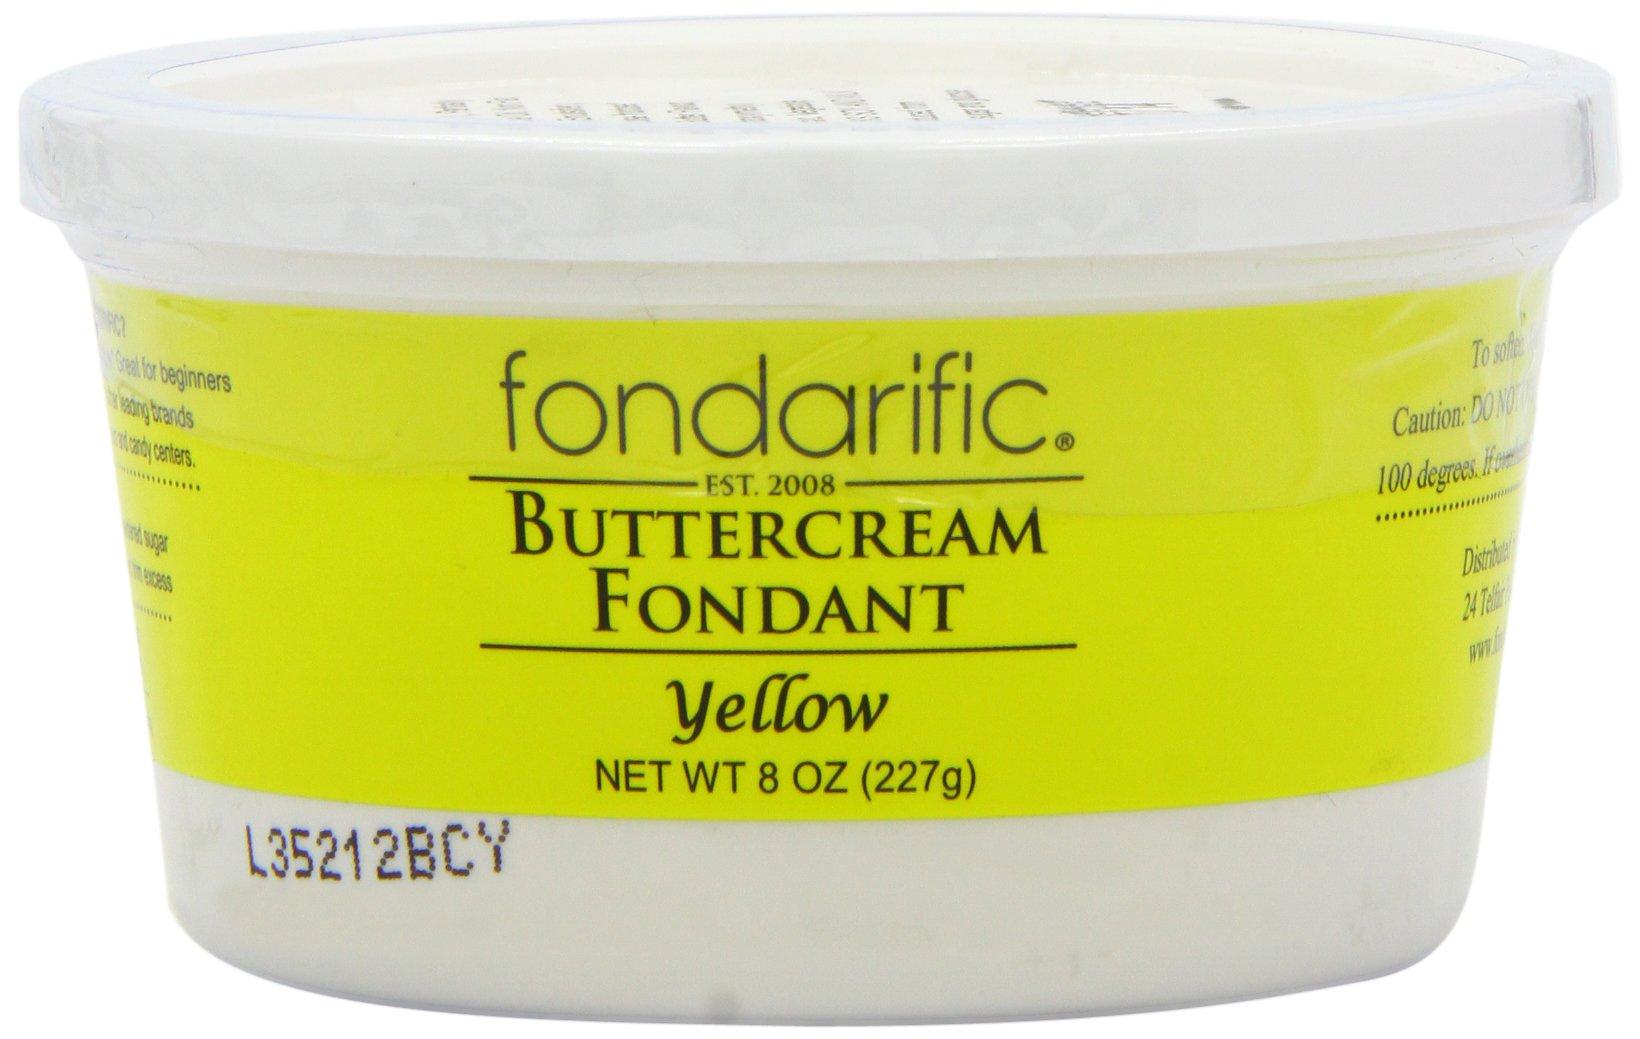 Fondarific Buttercream Fondant, Yellow, 8 Ounce